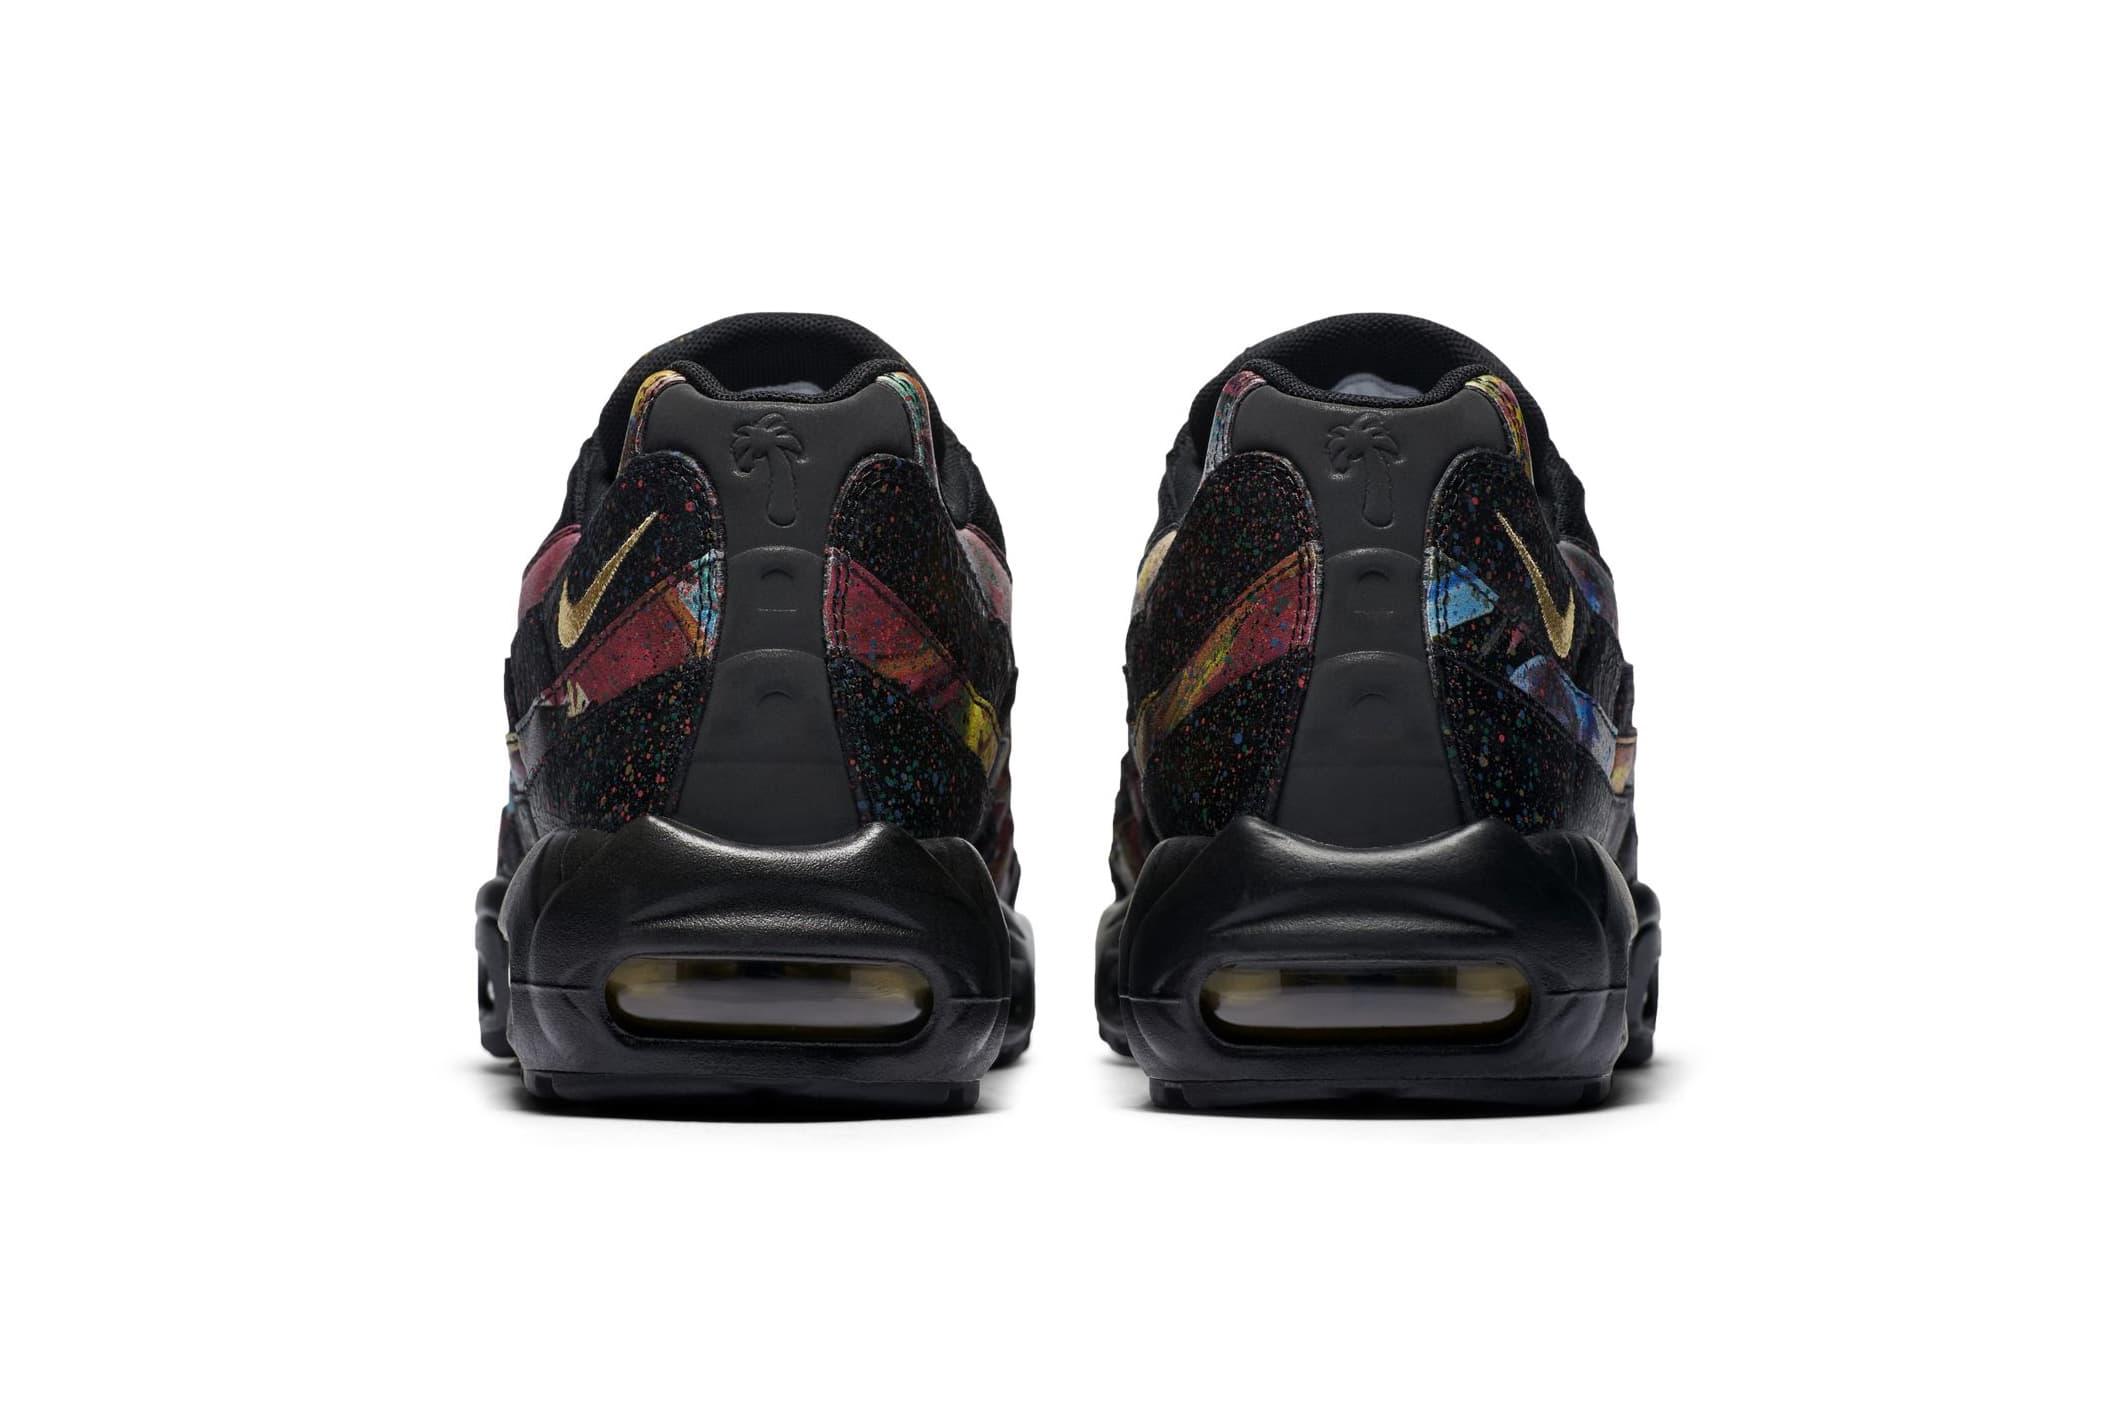 Nike Air Max 95 Paint Splatter Colorway first look sneaker multicolor black gold